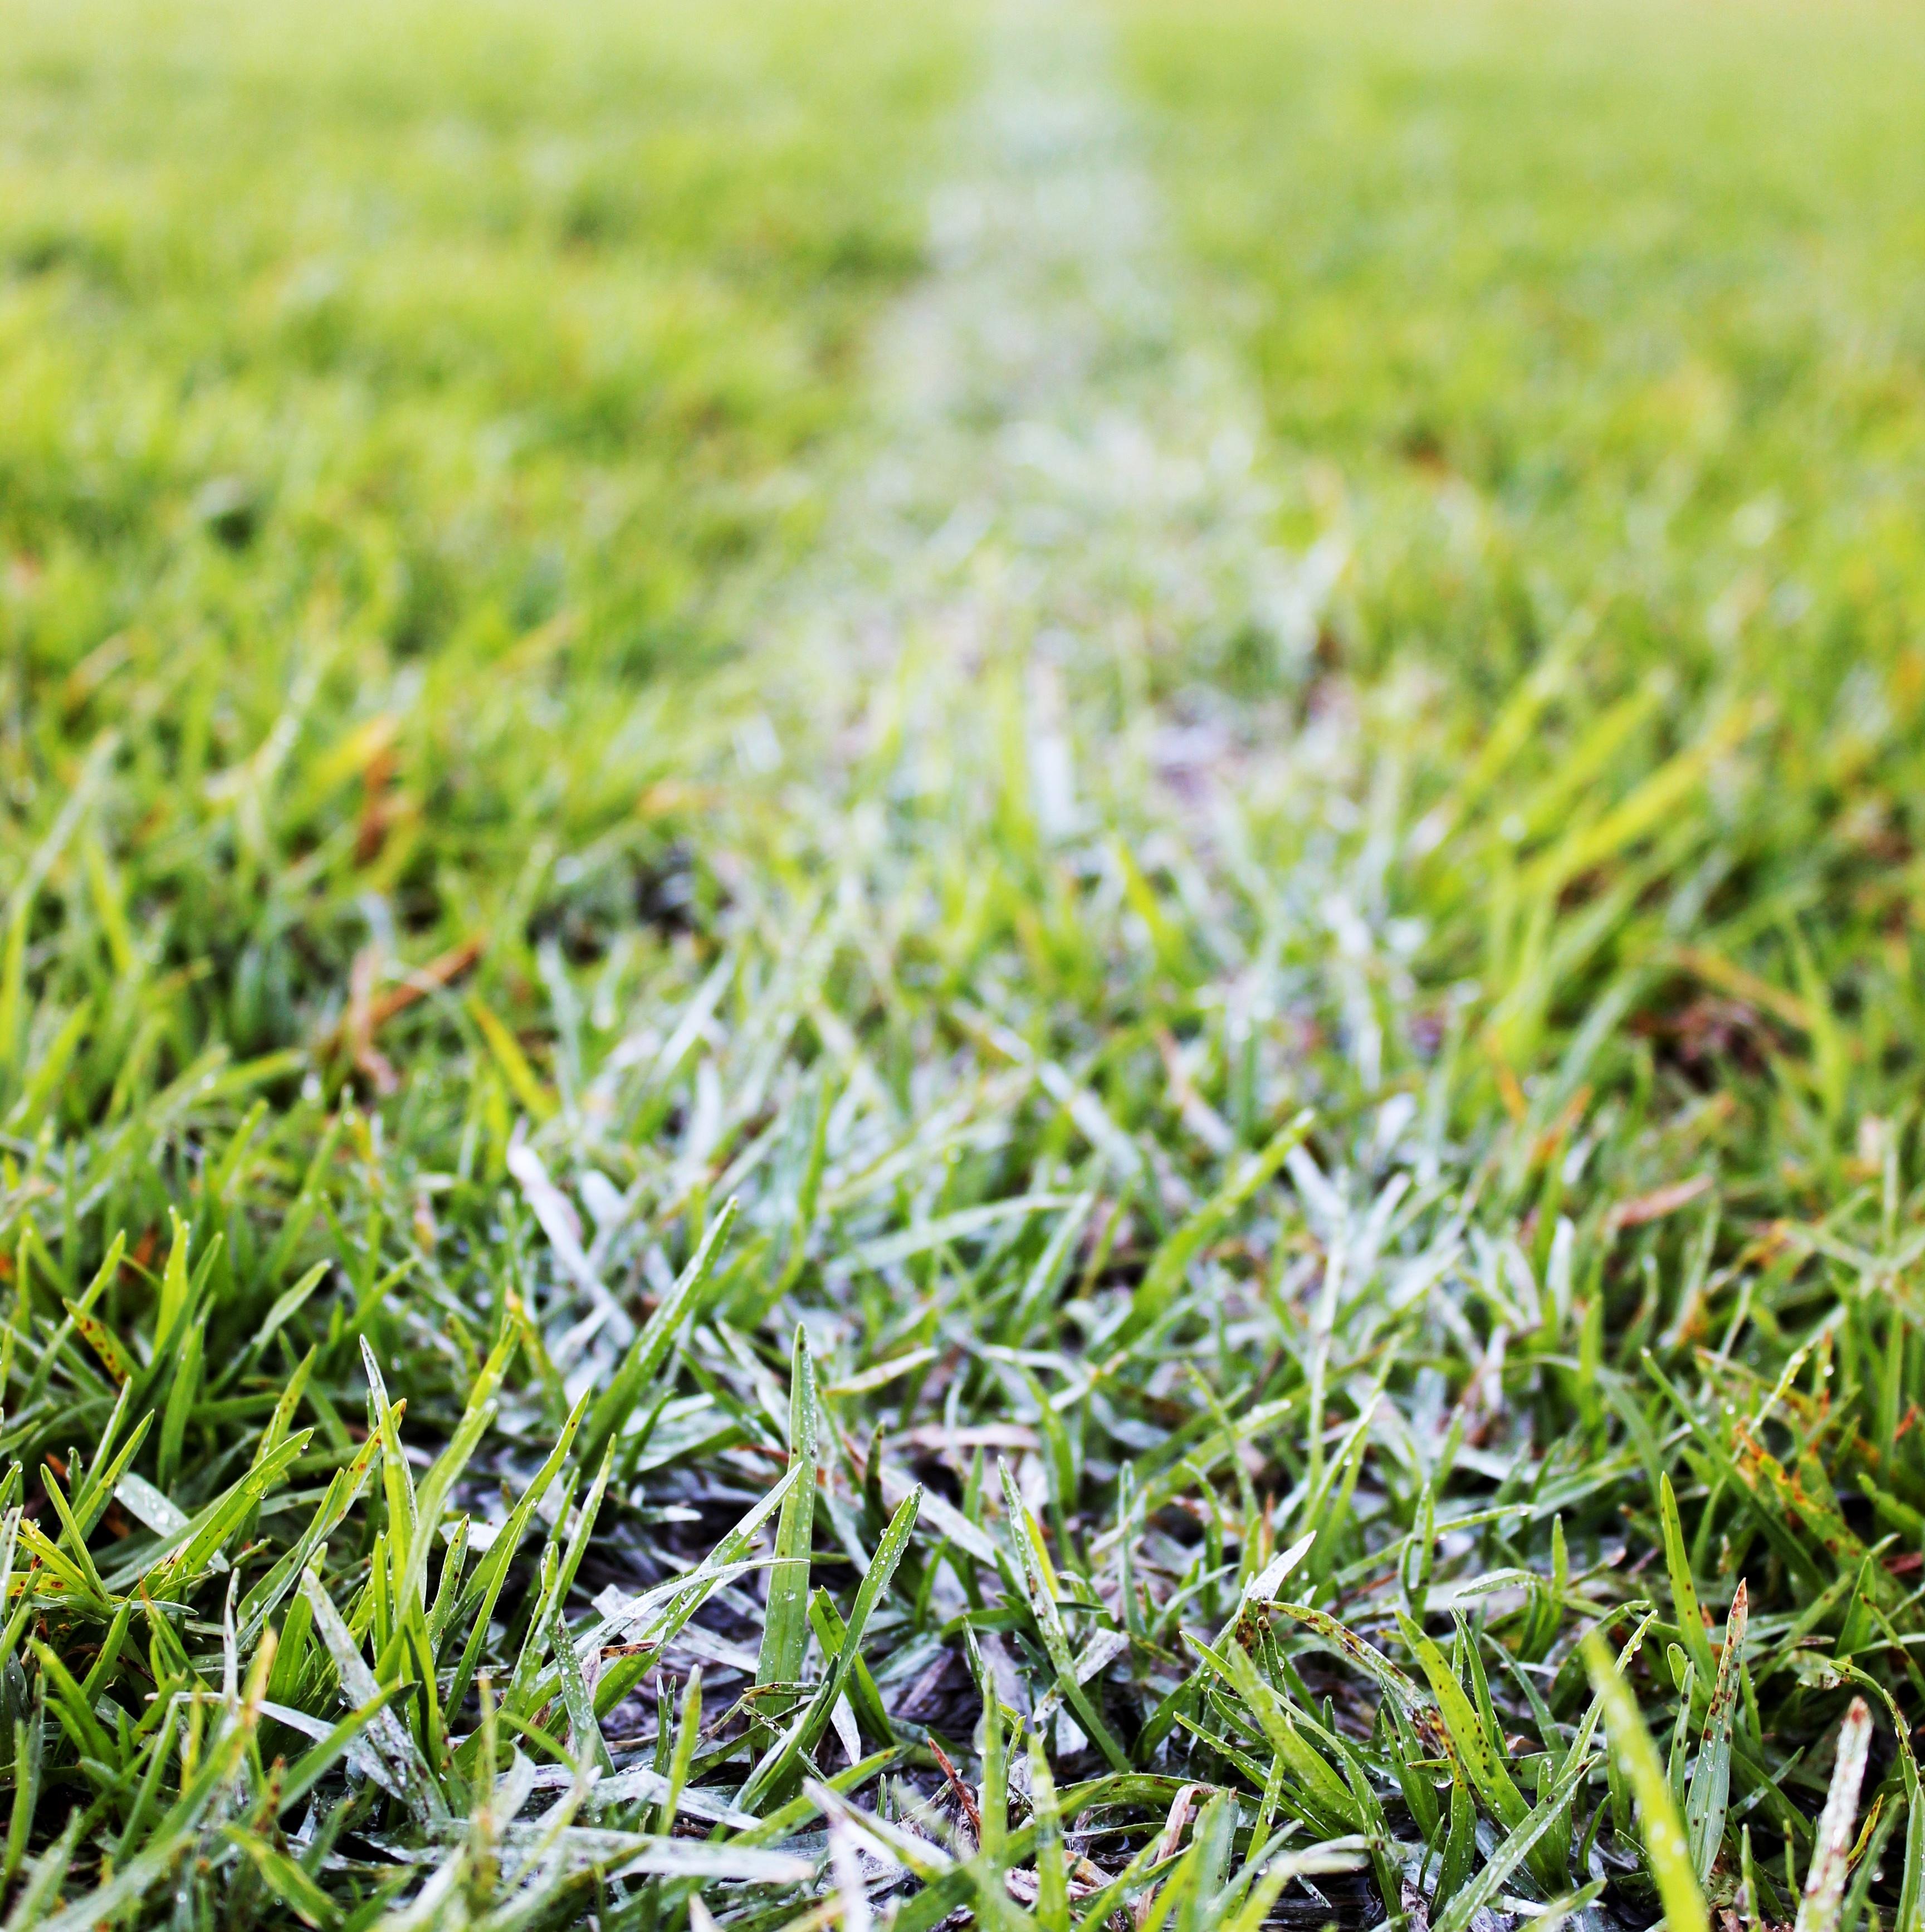 grass american football field. Nature Grass Plant Sun Sport Field Lawn Meadow Leaf Flower Summer Line Green Soil Football Stadium American